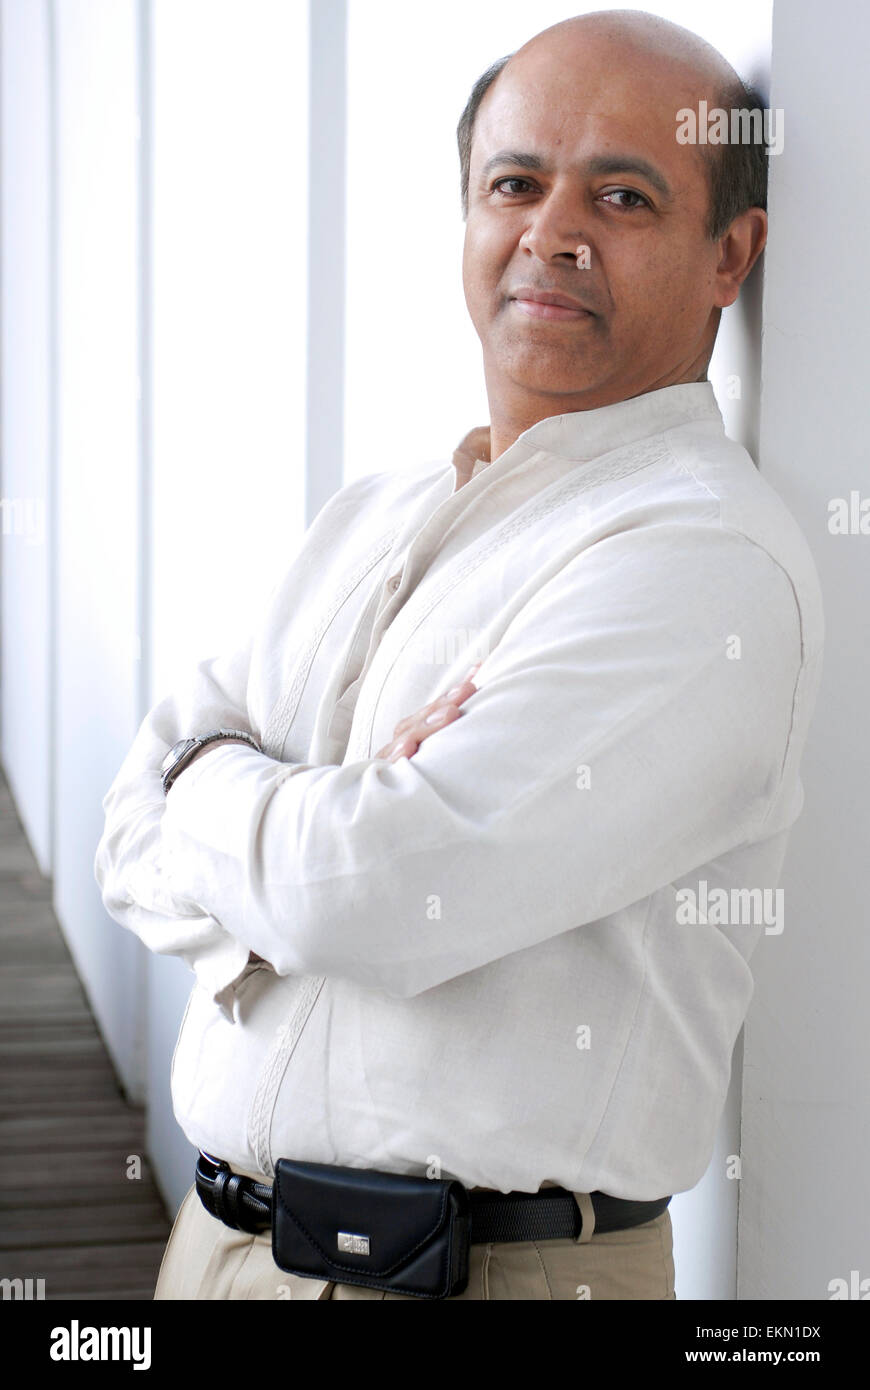 Abraham Verghese. Etiope scrittore e medico. Immagini Stock